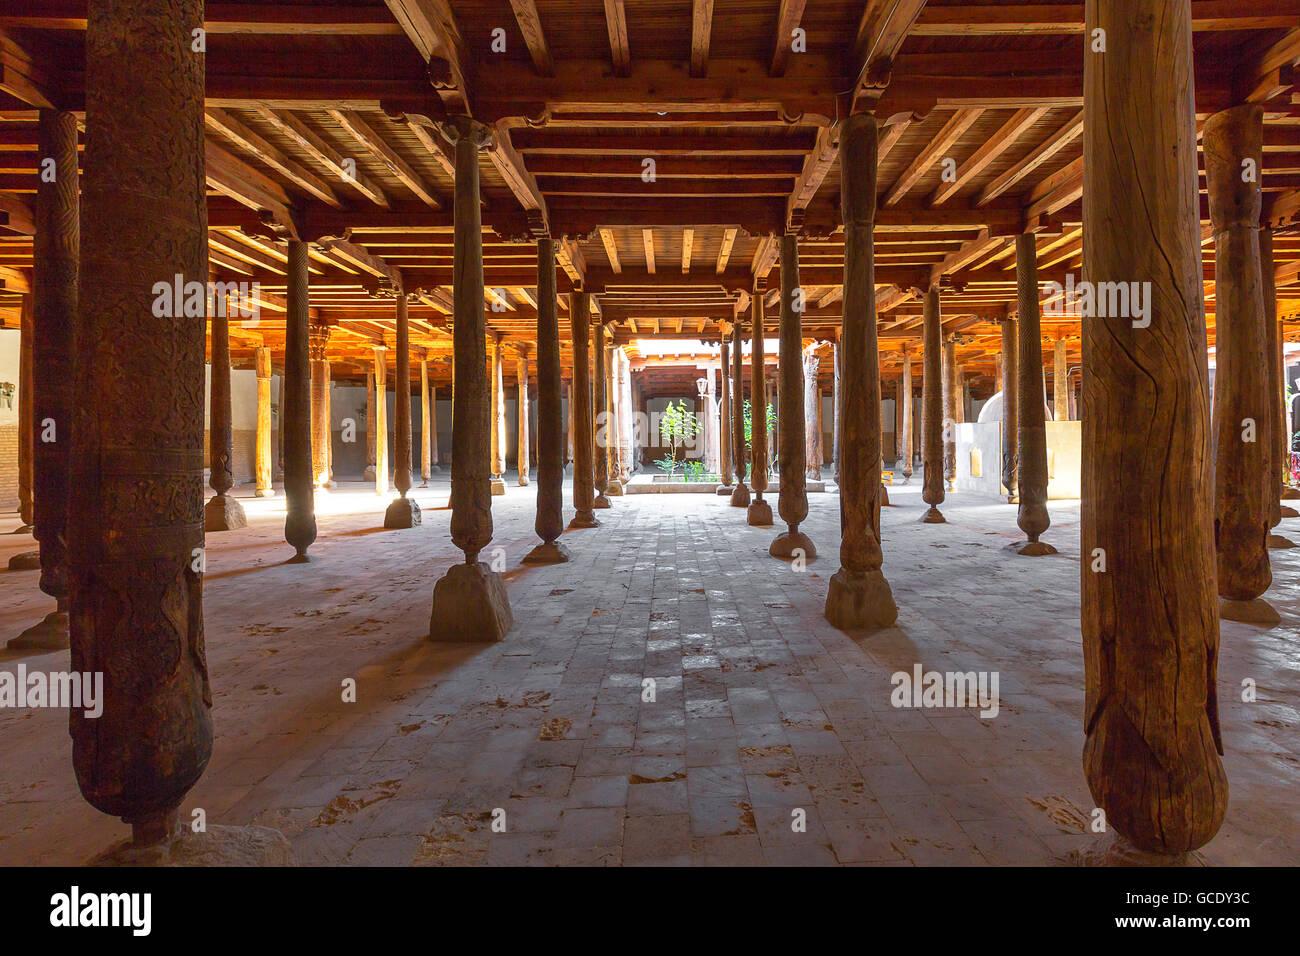 Wooden columns of the Juma Mosque in Khiva, Uzbekistan. - Stock Image